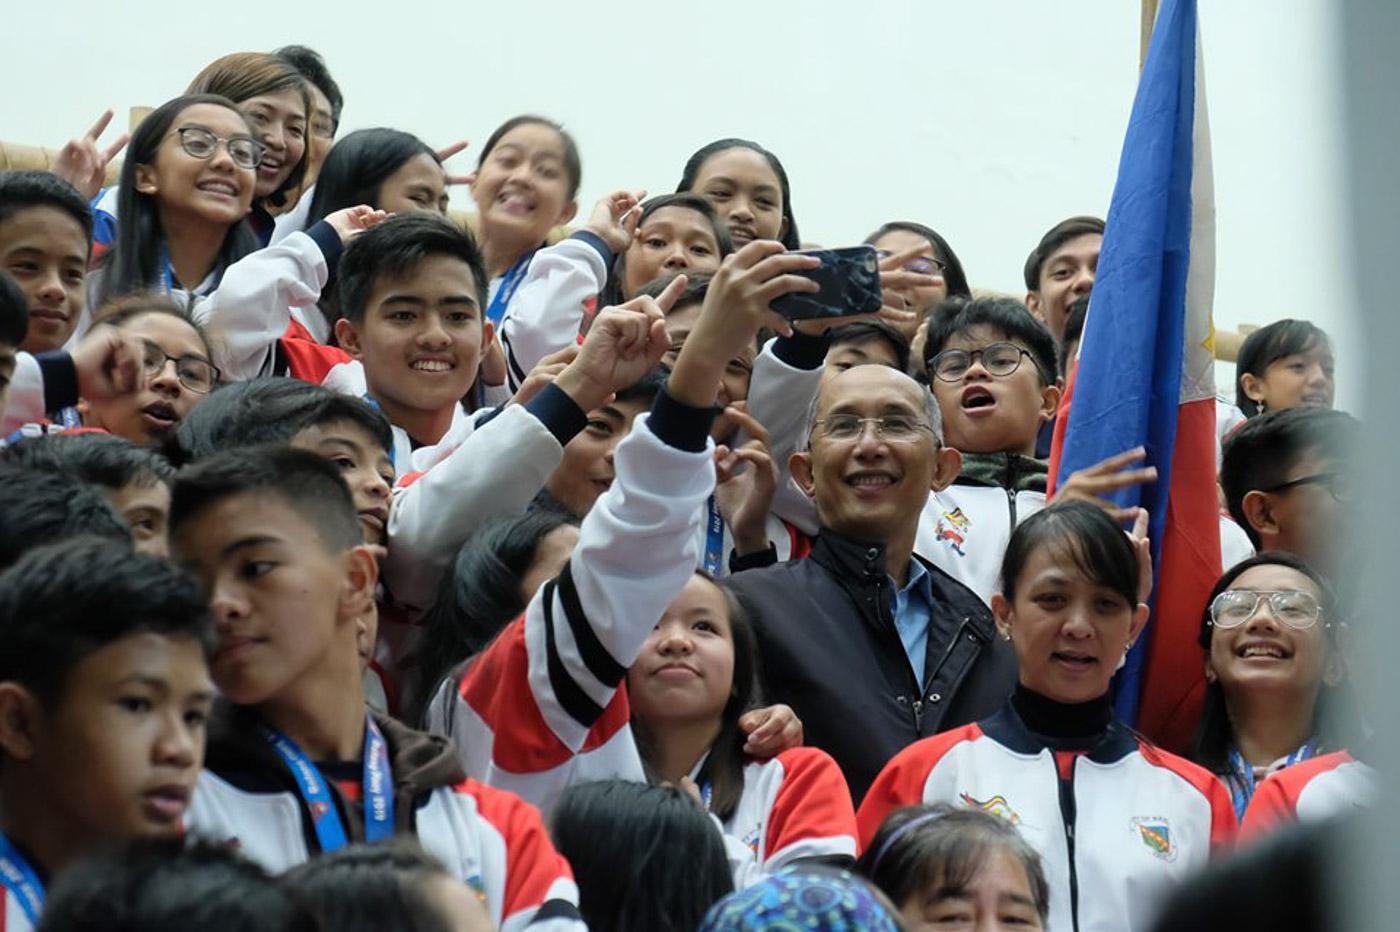 BAGUIO CHIEF. Baguio Mayor Benjamin Magalong with students. Photo courtesy of Baguio City PIO